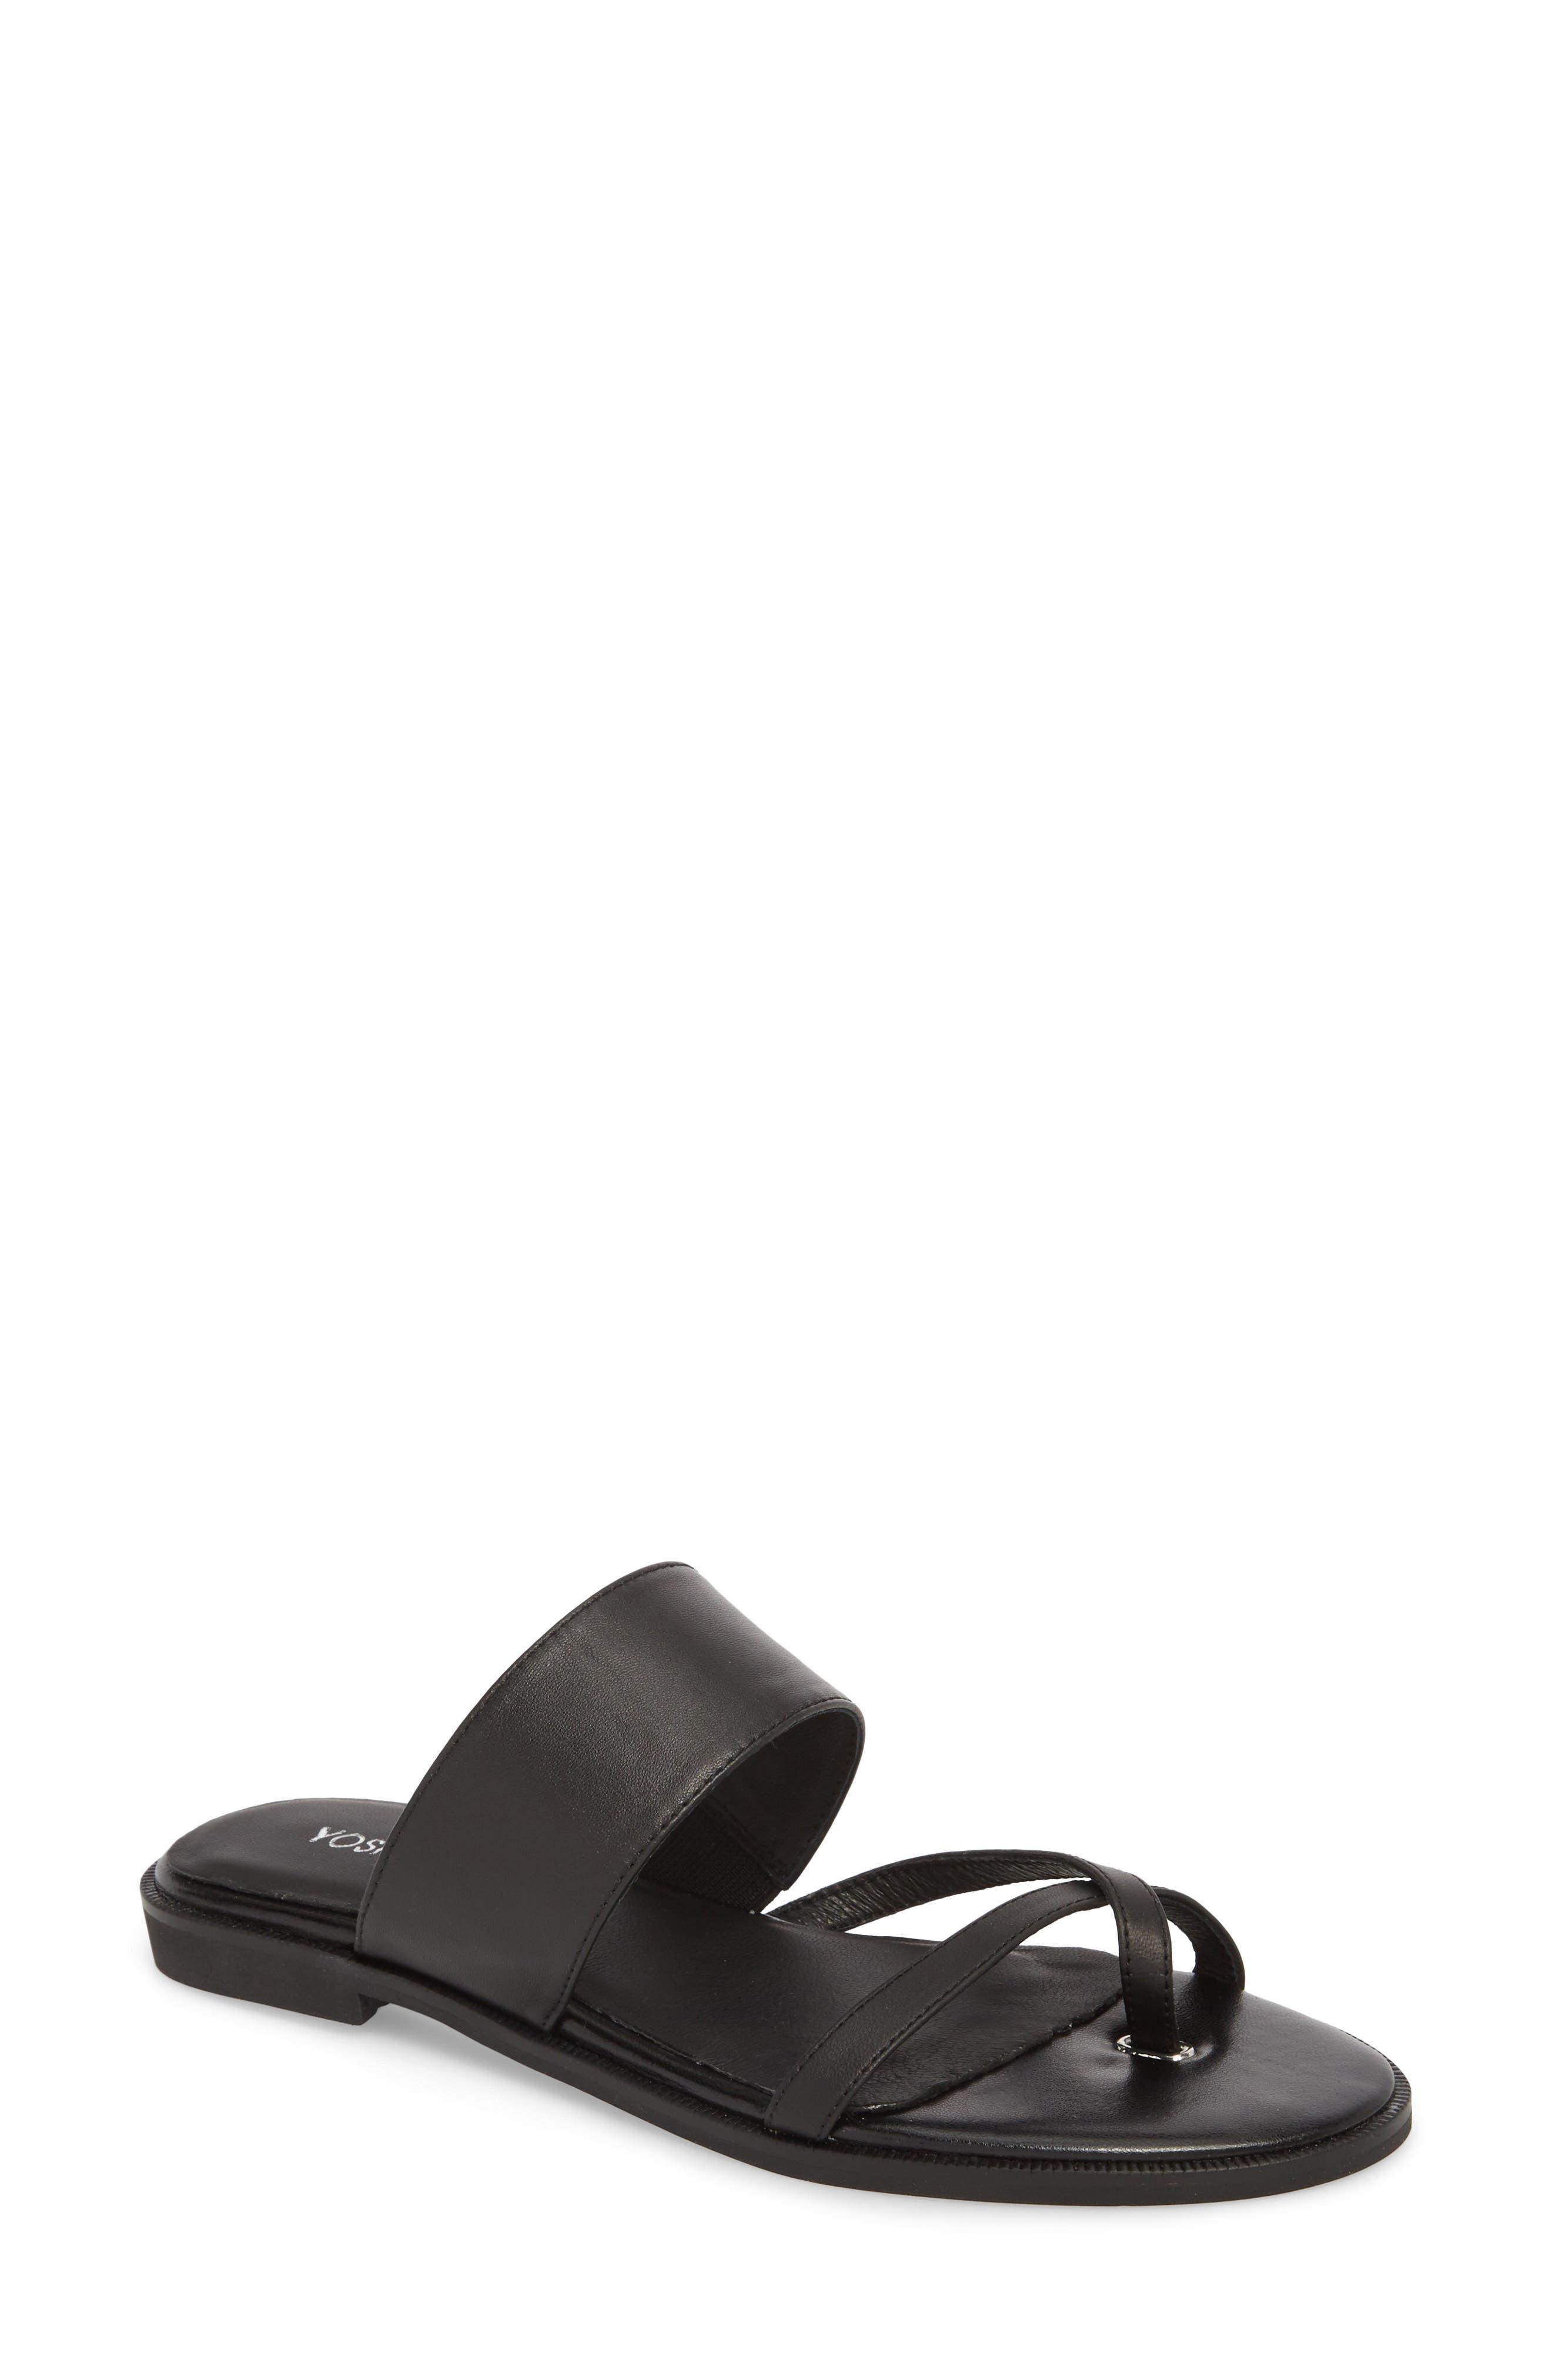 Carina Slide Sandal,                         Main,                         color,